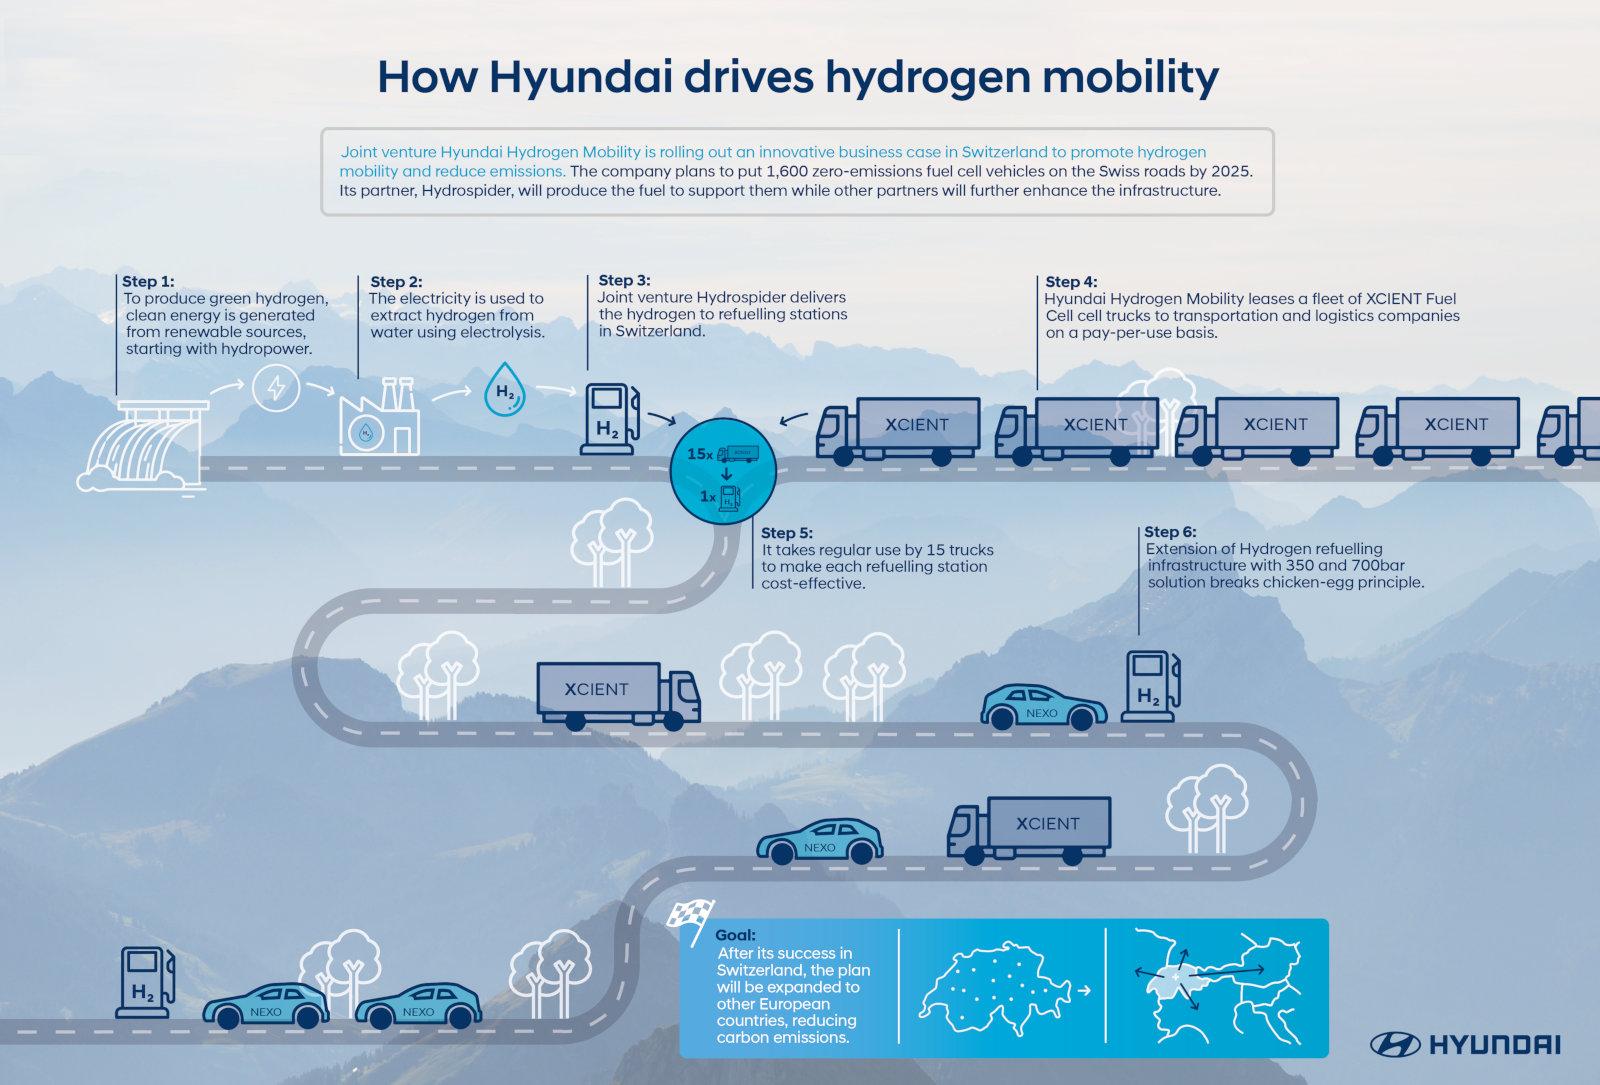 hyundai-hydrogen-mobility-infographic-1610